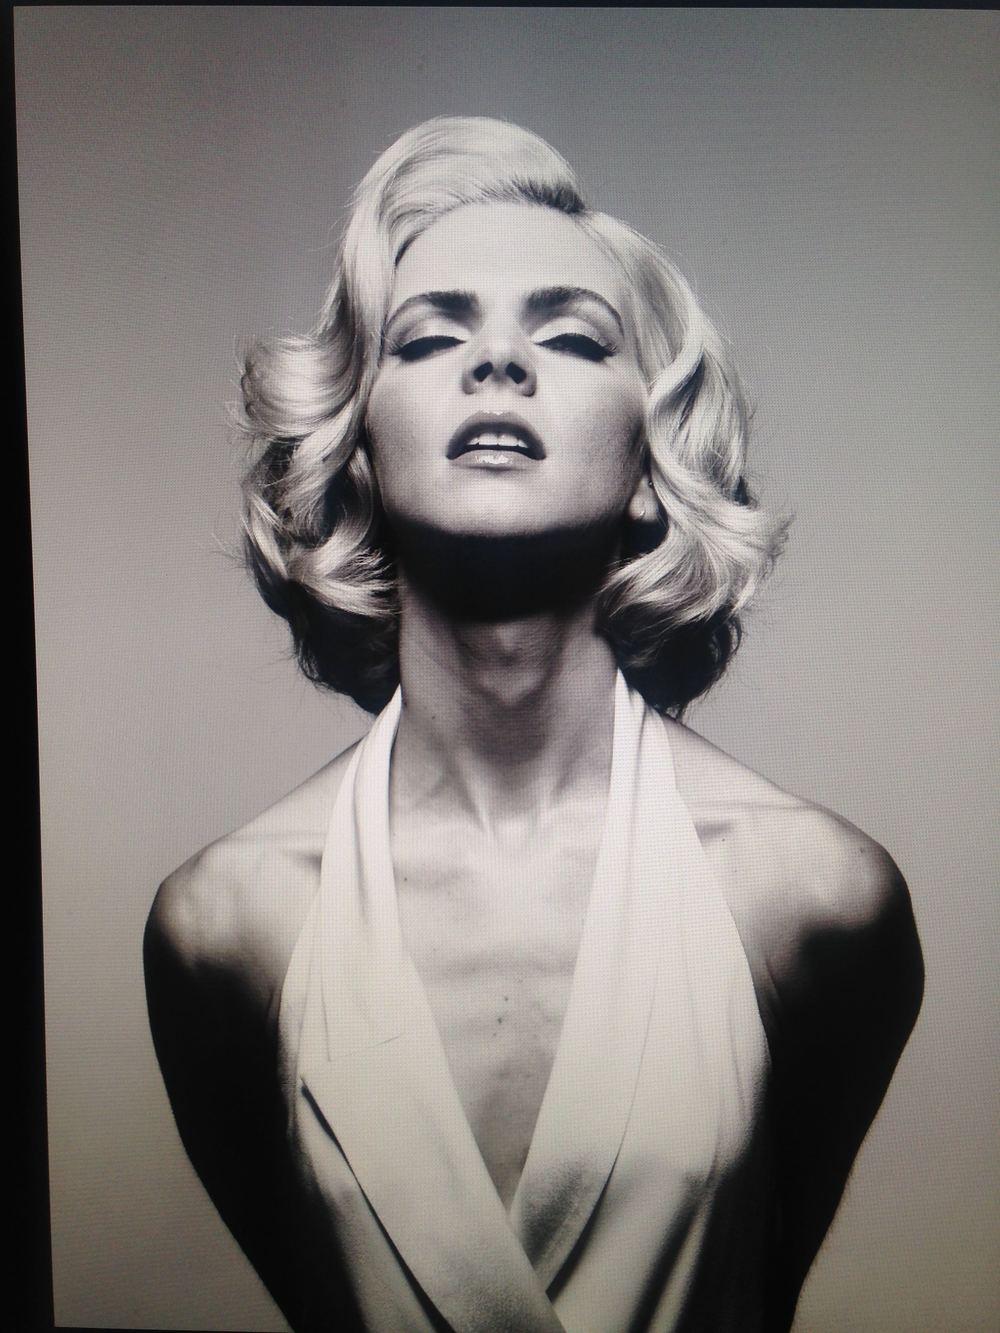 Athena cosmetics image copy.jpg